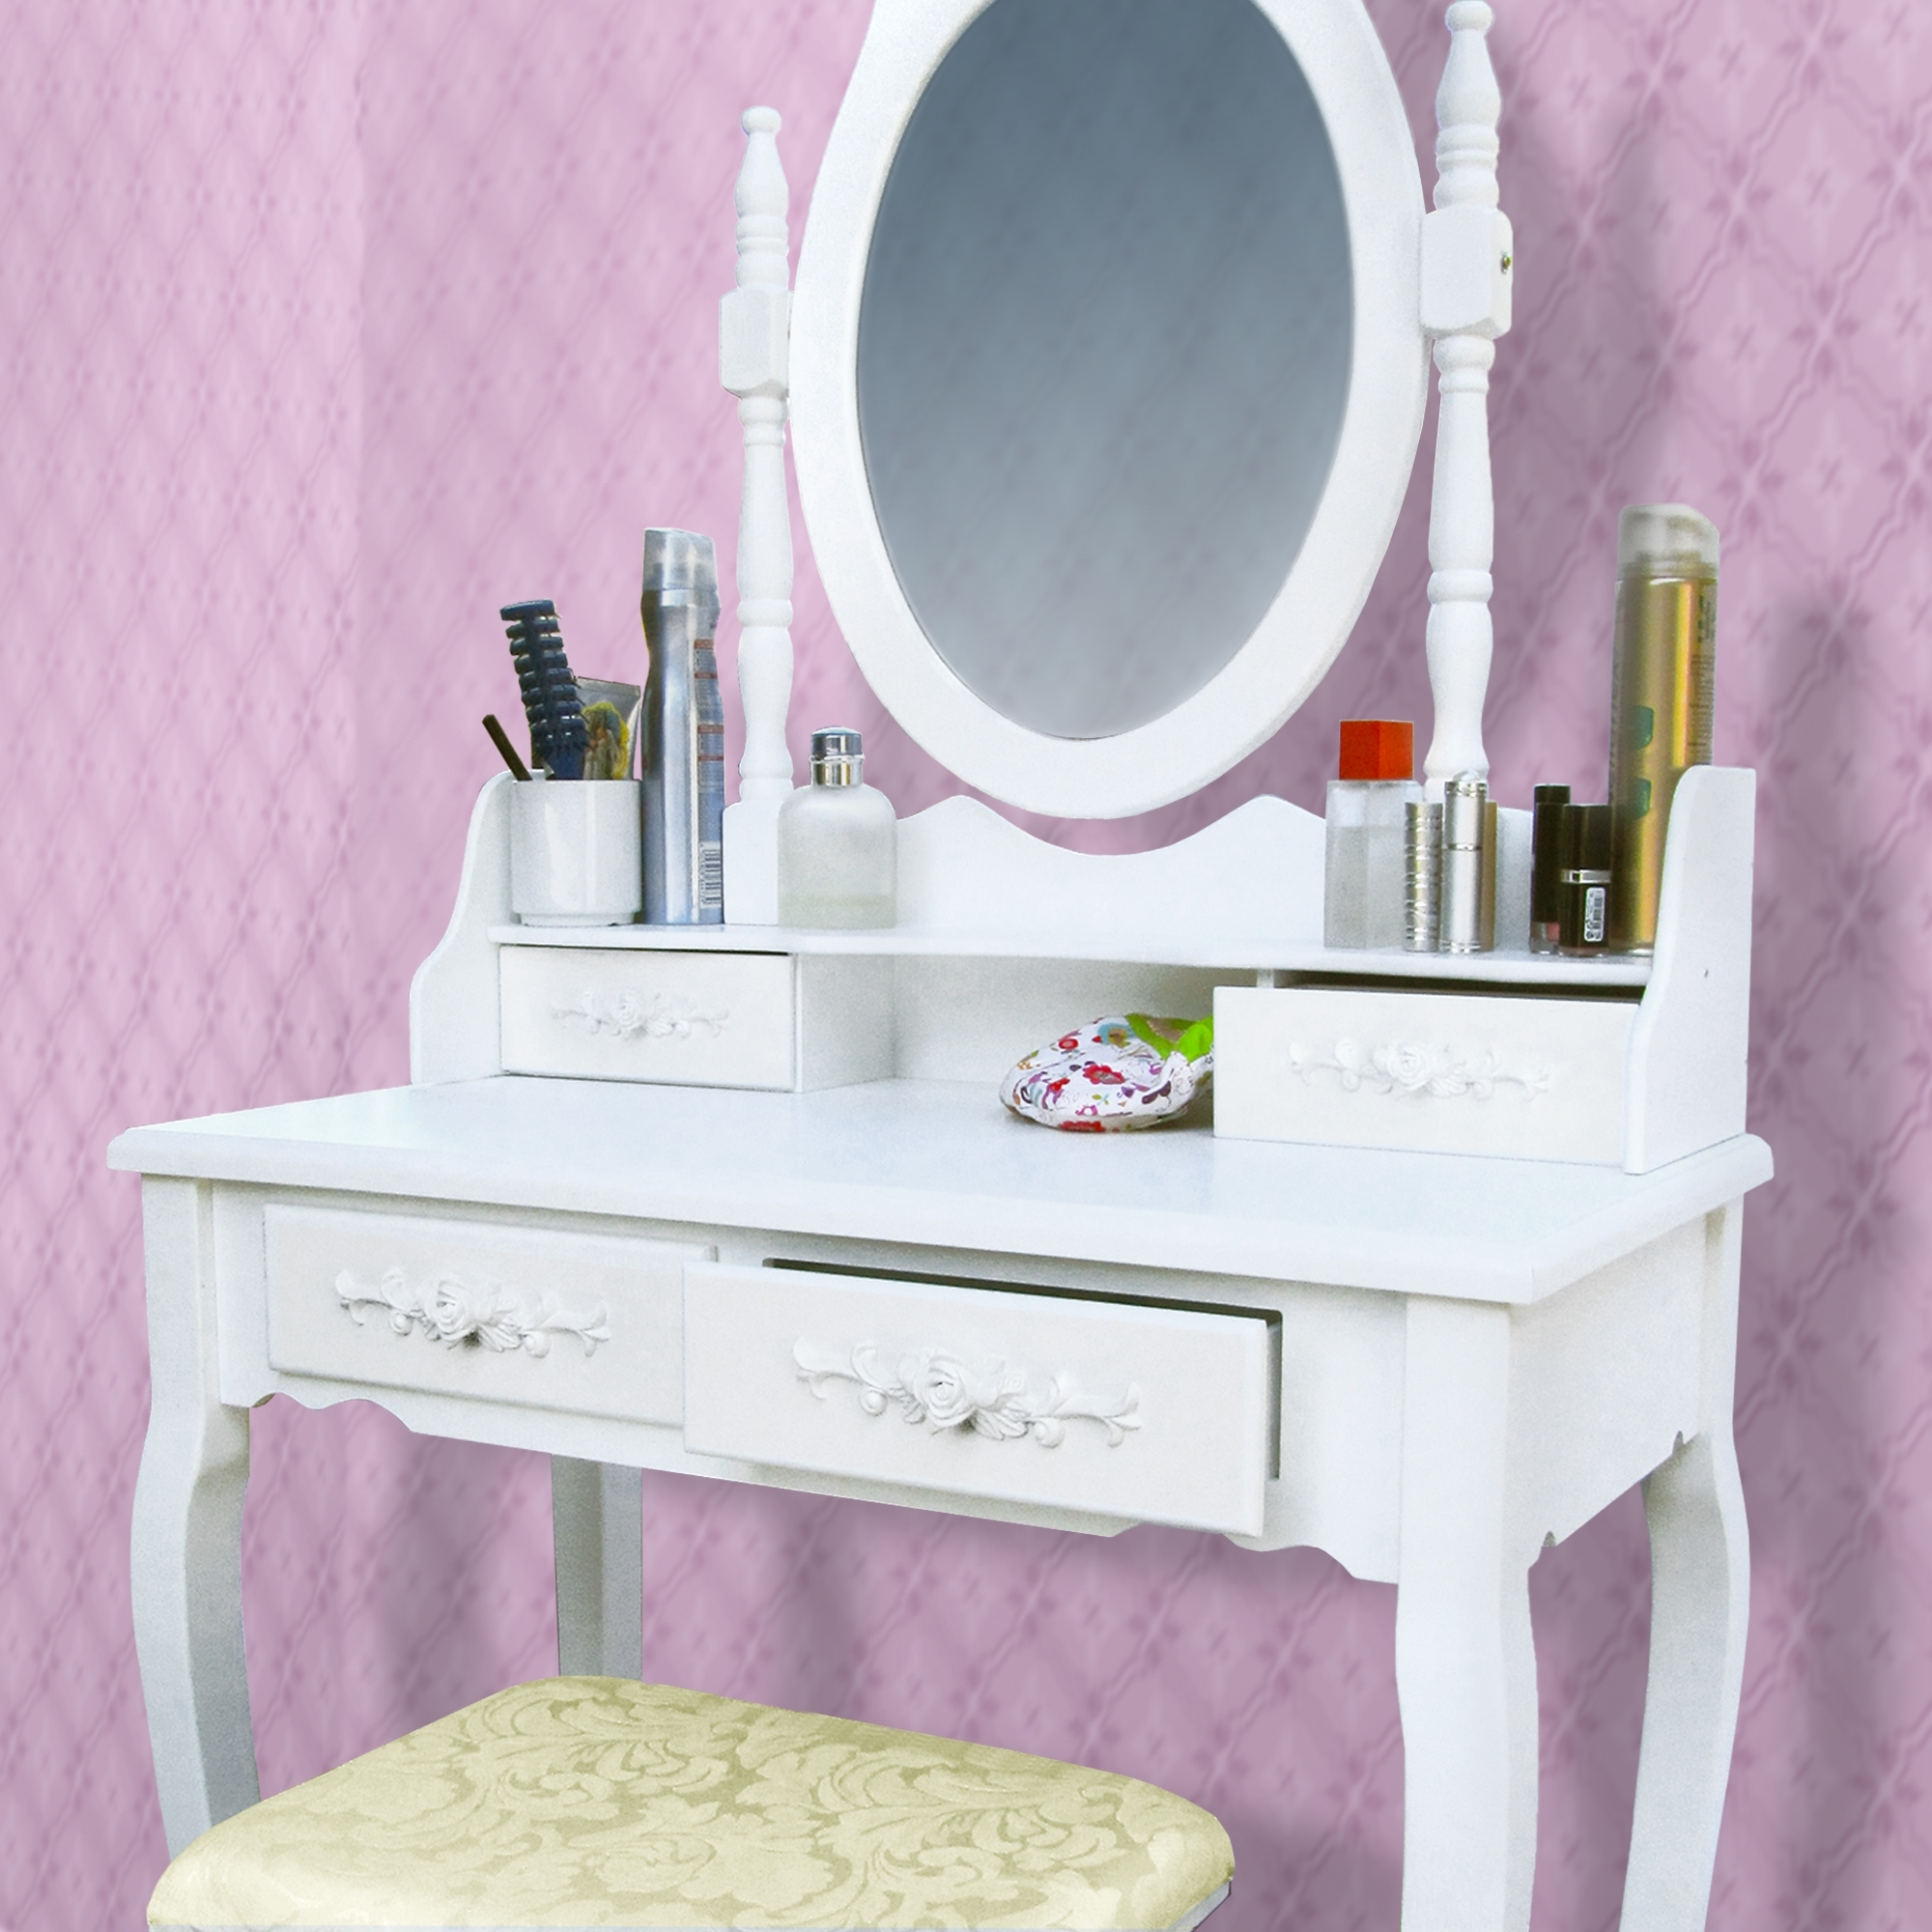 lagerhaus 4630. Black Bedroom Furniture Sets. Home Design Ideas